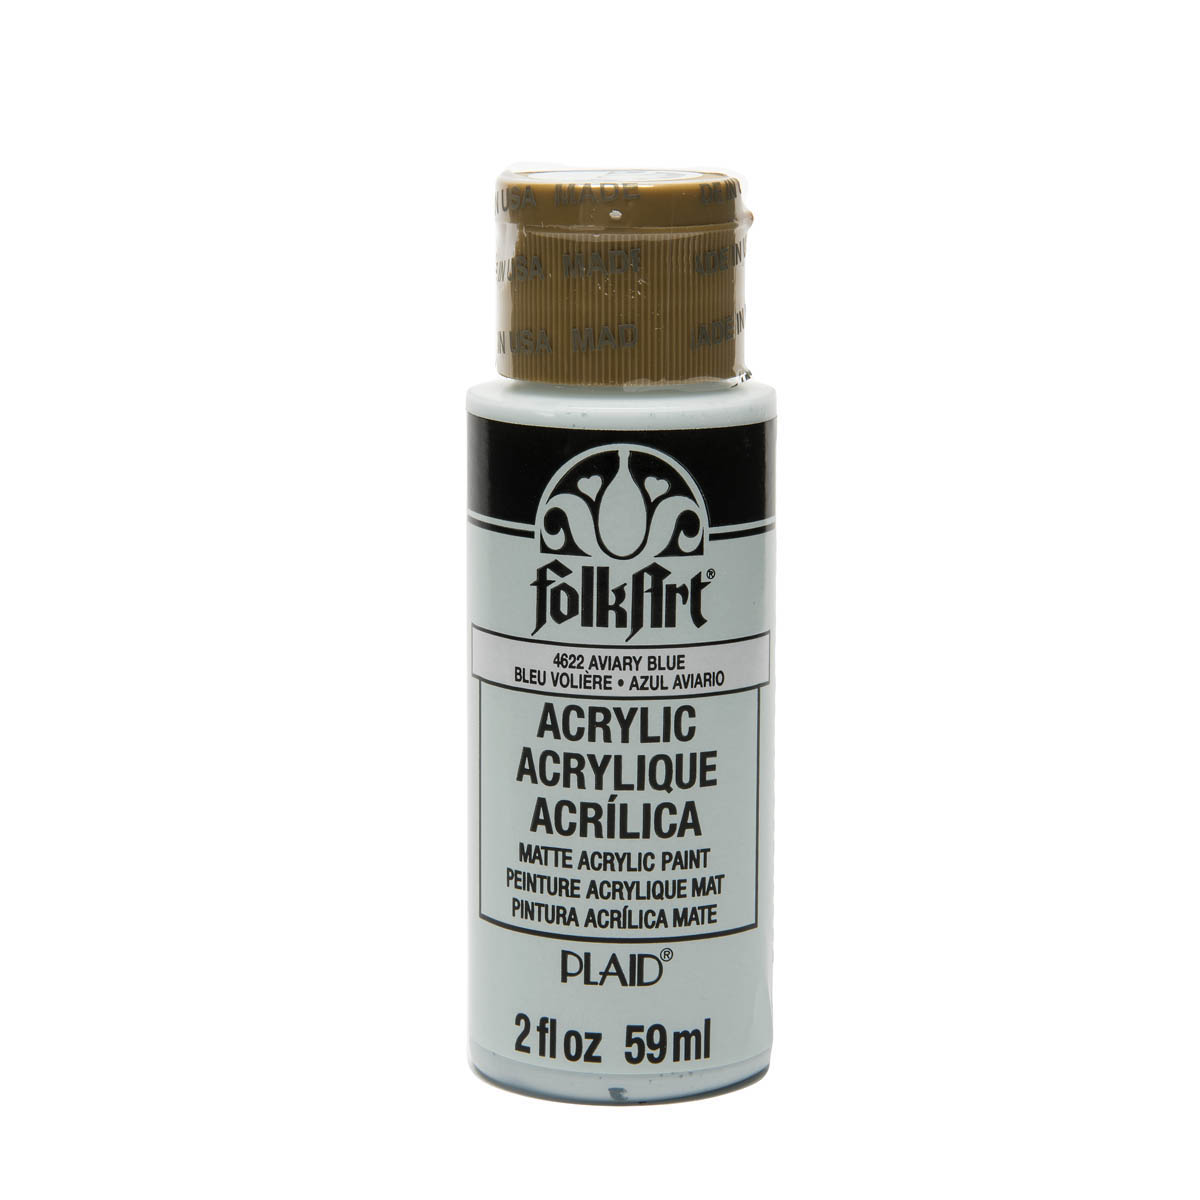 FolkArt ® Acrylic Colors - Aviary Blue, 2 oz. - 4622